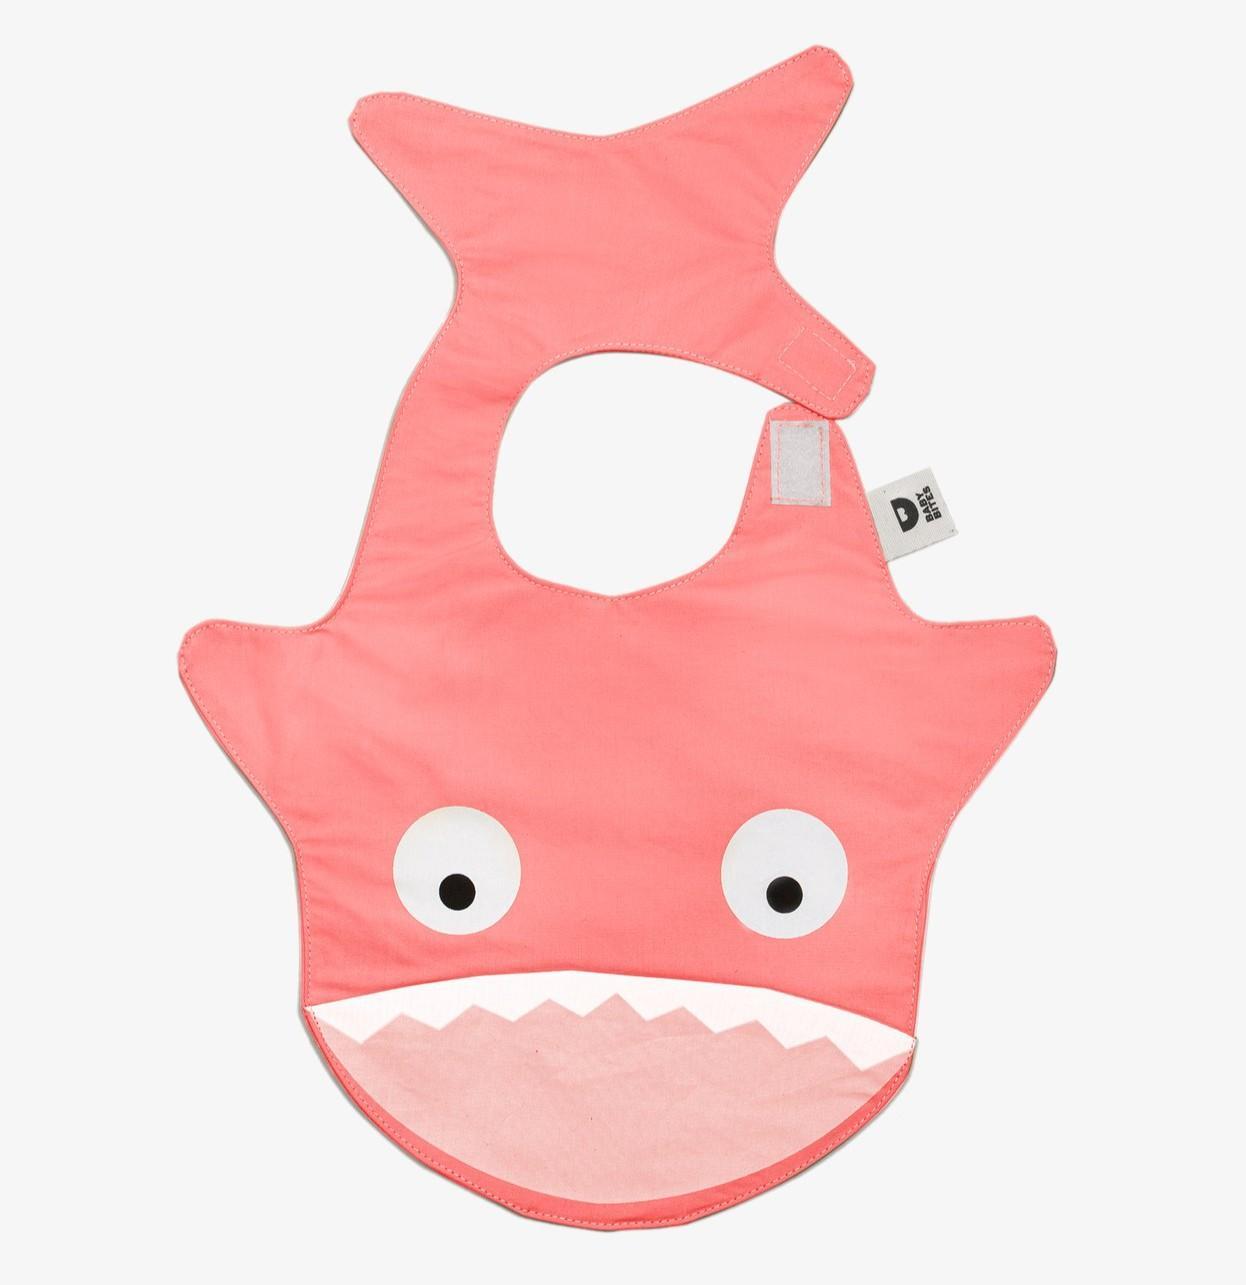 Baby Bites - Impermeable Bib - Pink